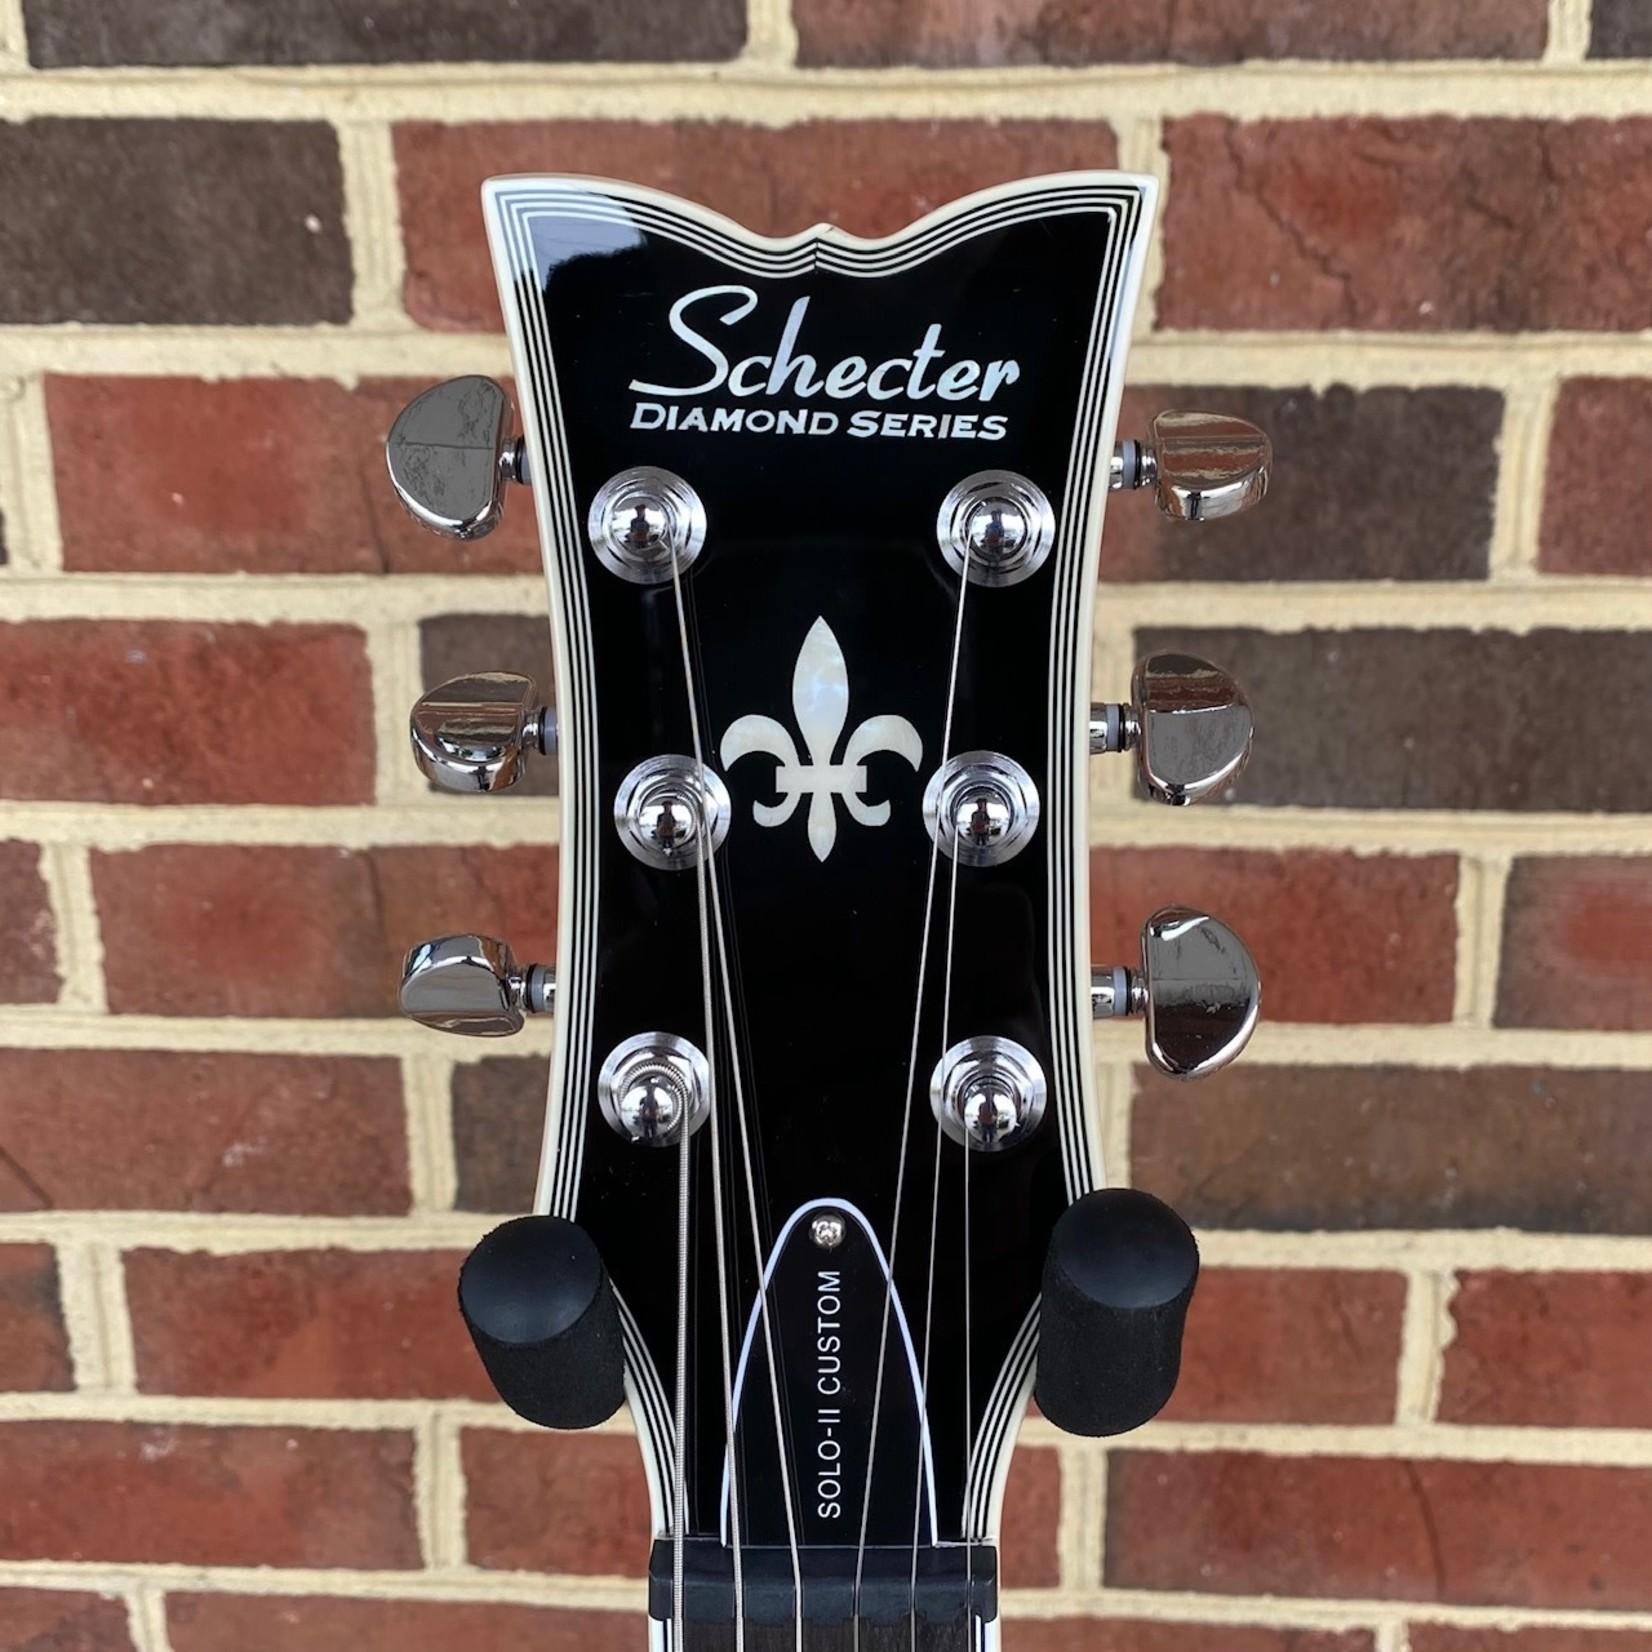 Schecter Guitar Research Schecter Solo II Custom, Trans Black Burst, Ebony Fretboard, Block Inlays, Locking Tuners